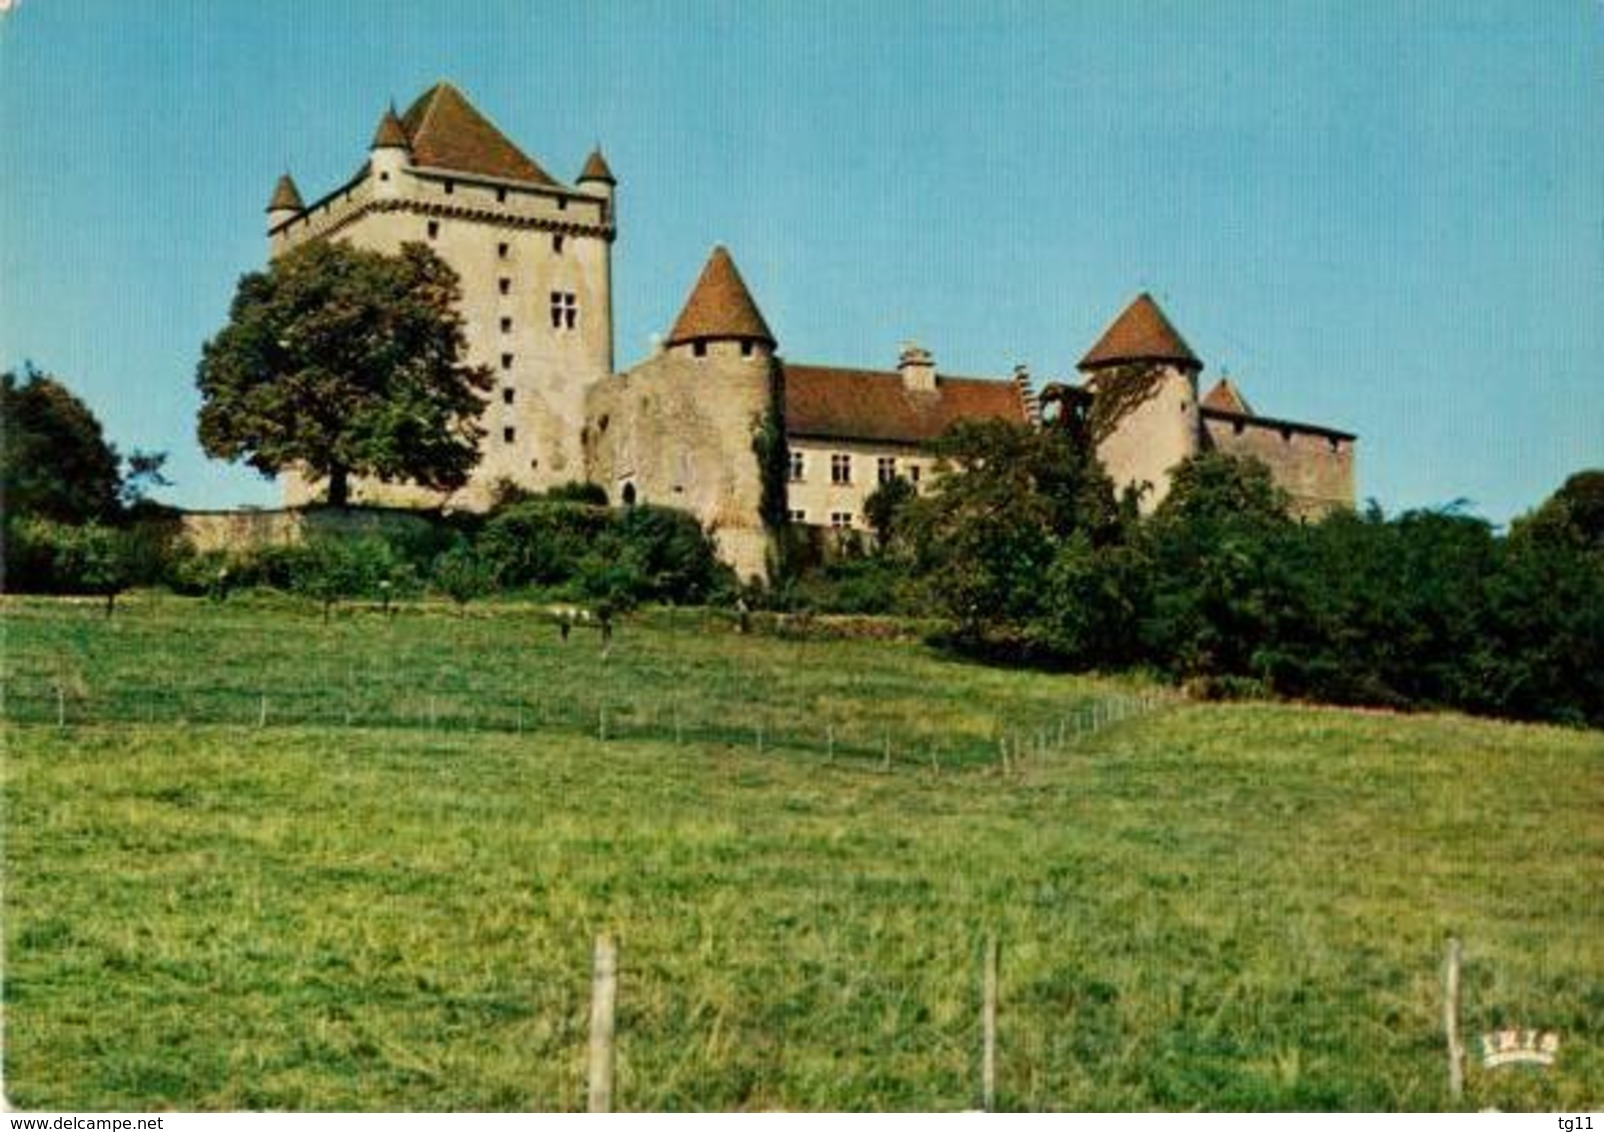 39 - CHÂTEAU DU PIN - Frankreich